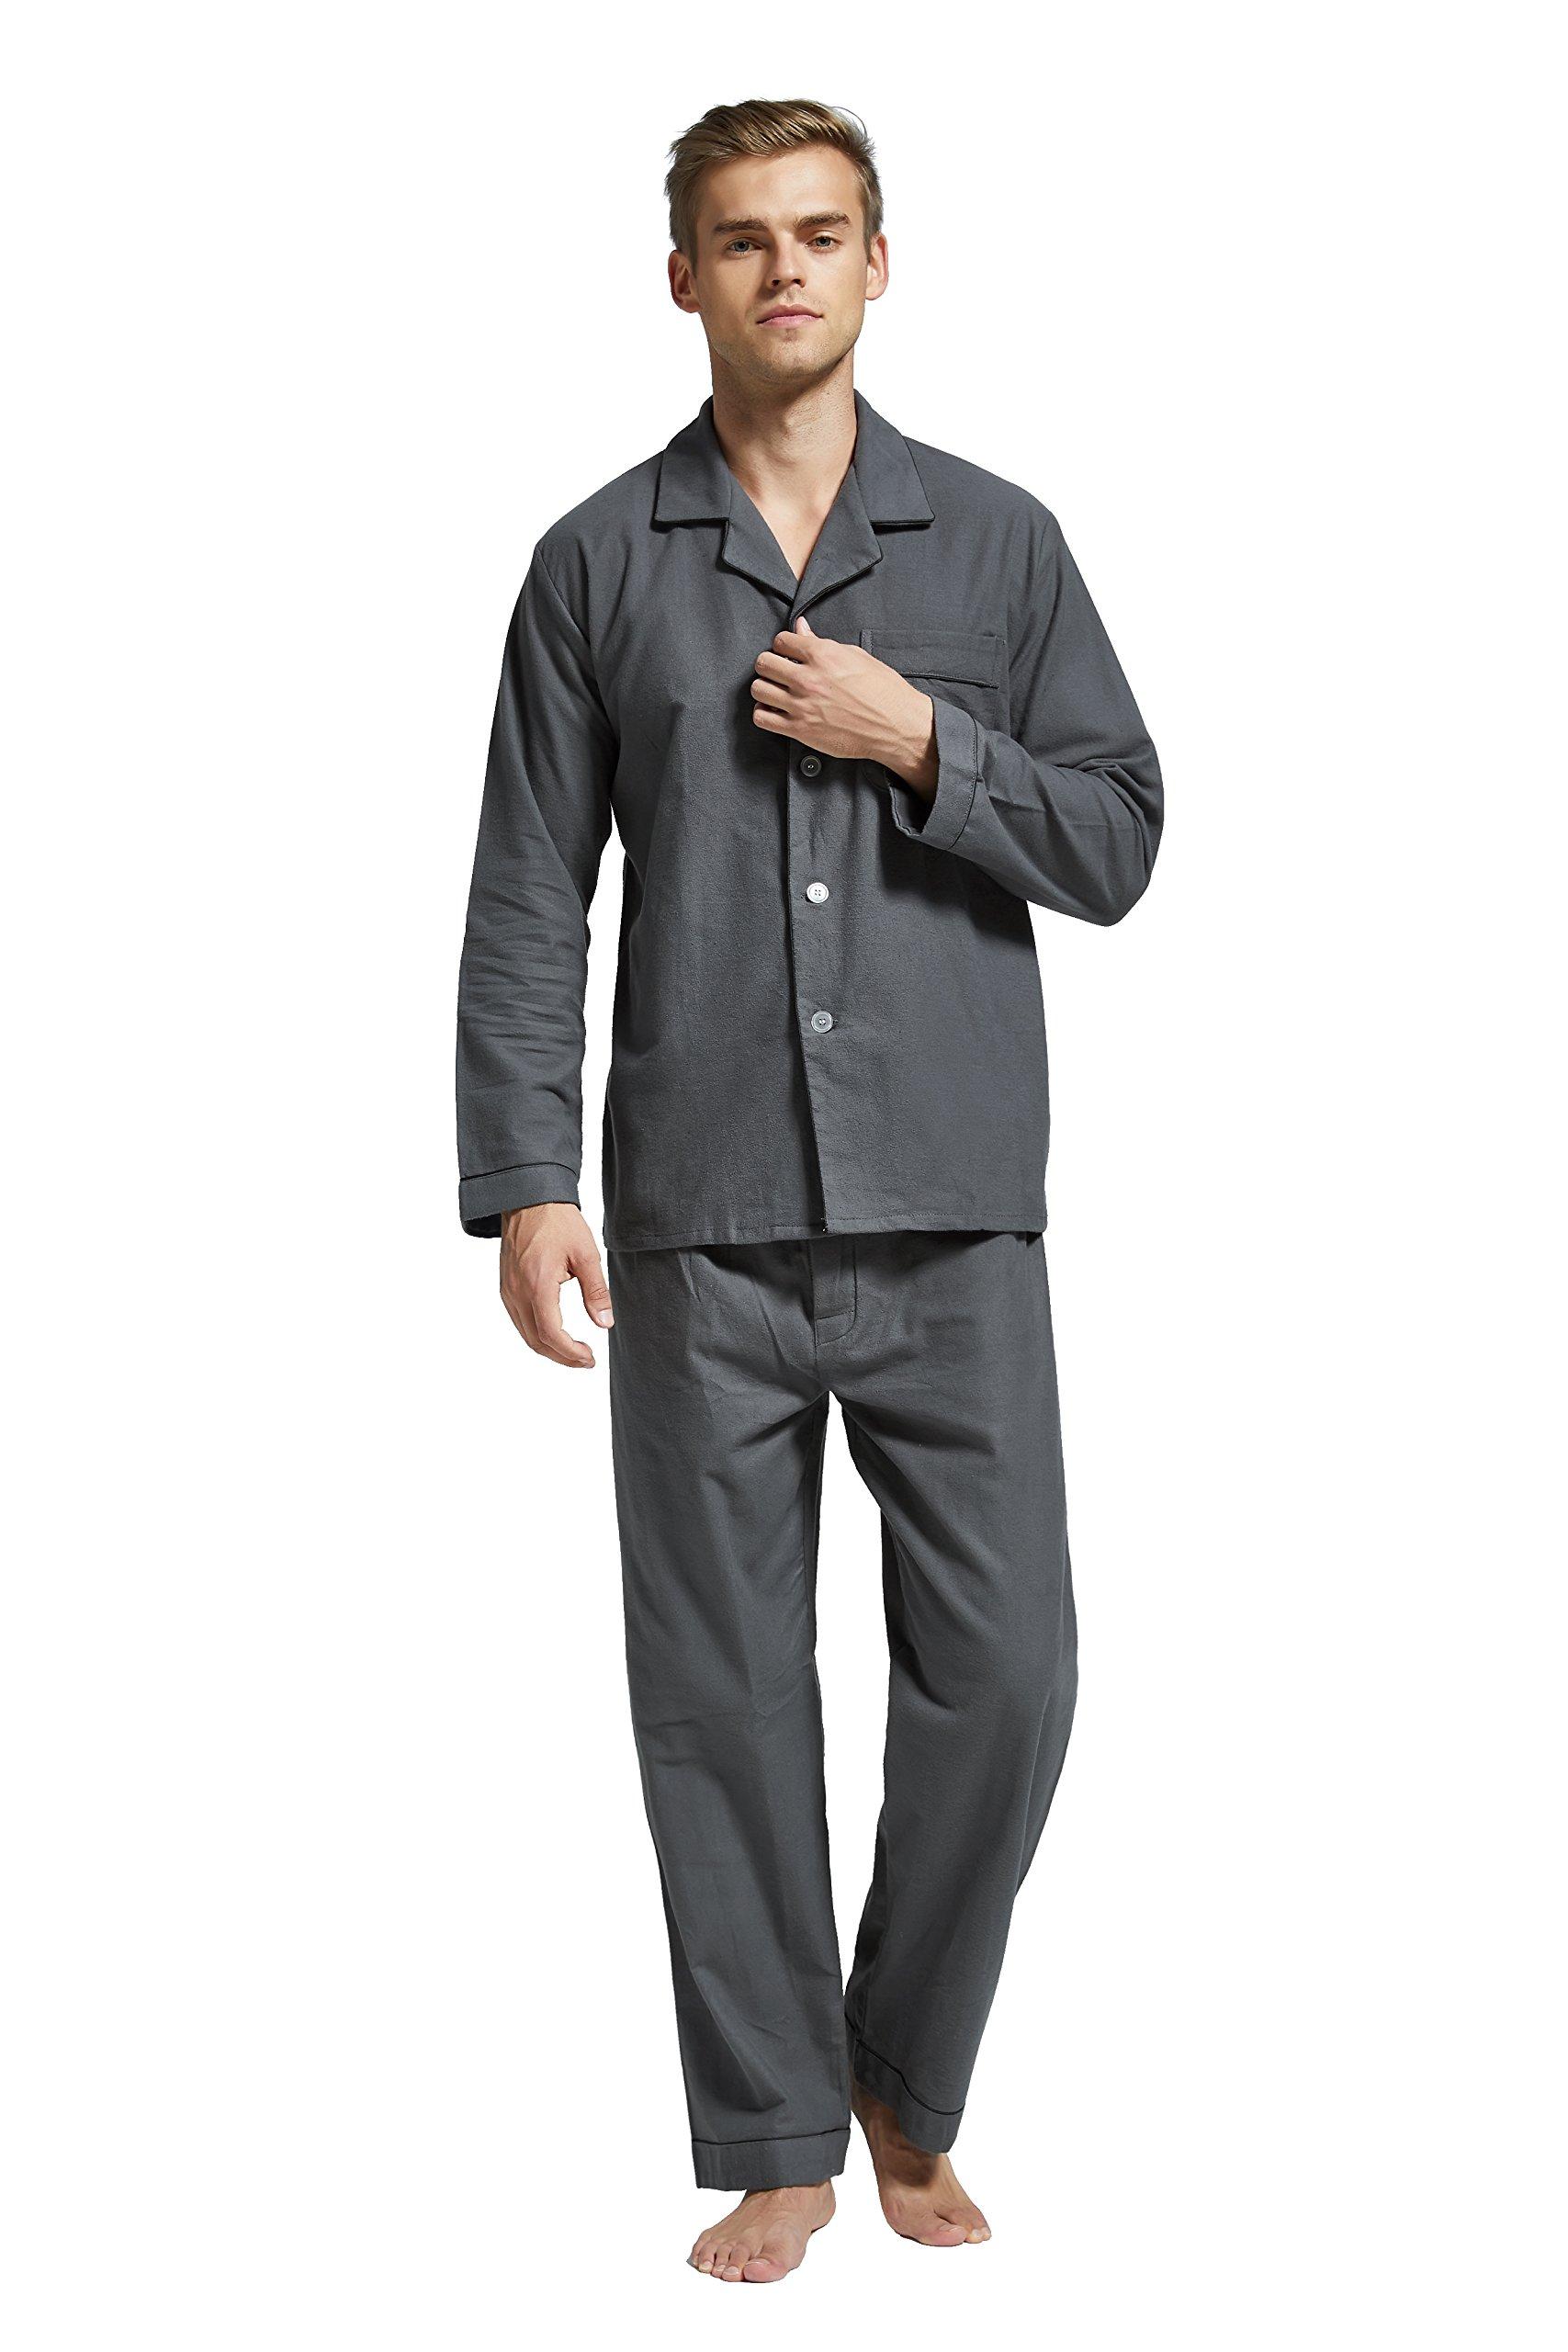 TONY AND CANDICE Men's Flannel Pajama Set, 100% Cotton Long Sleeve Sleepwear (Medium, Grey with Black Piping)